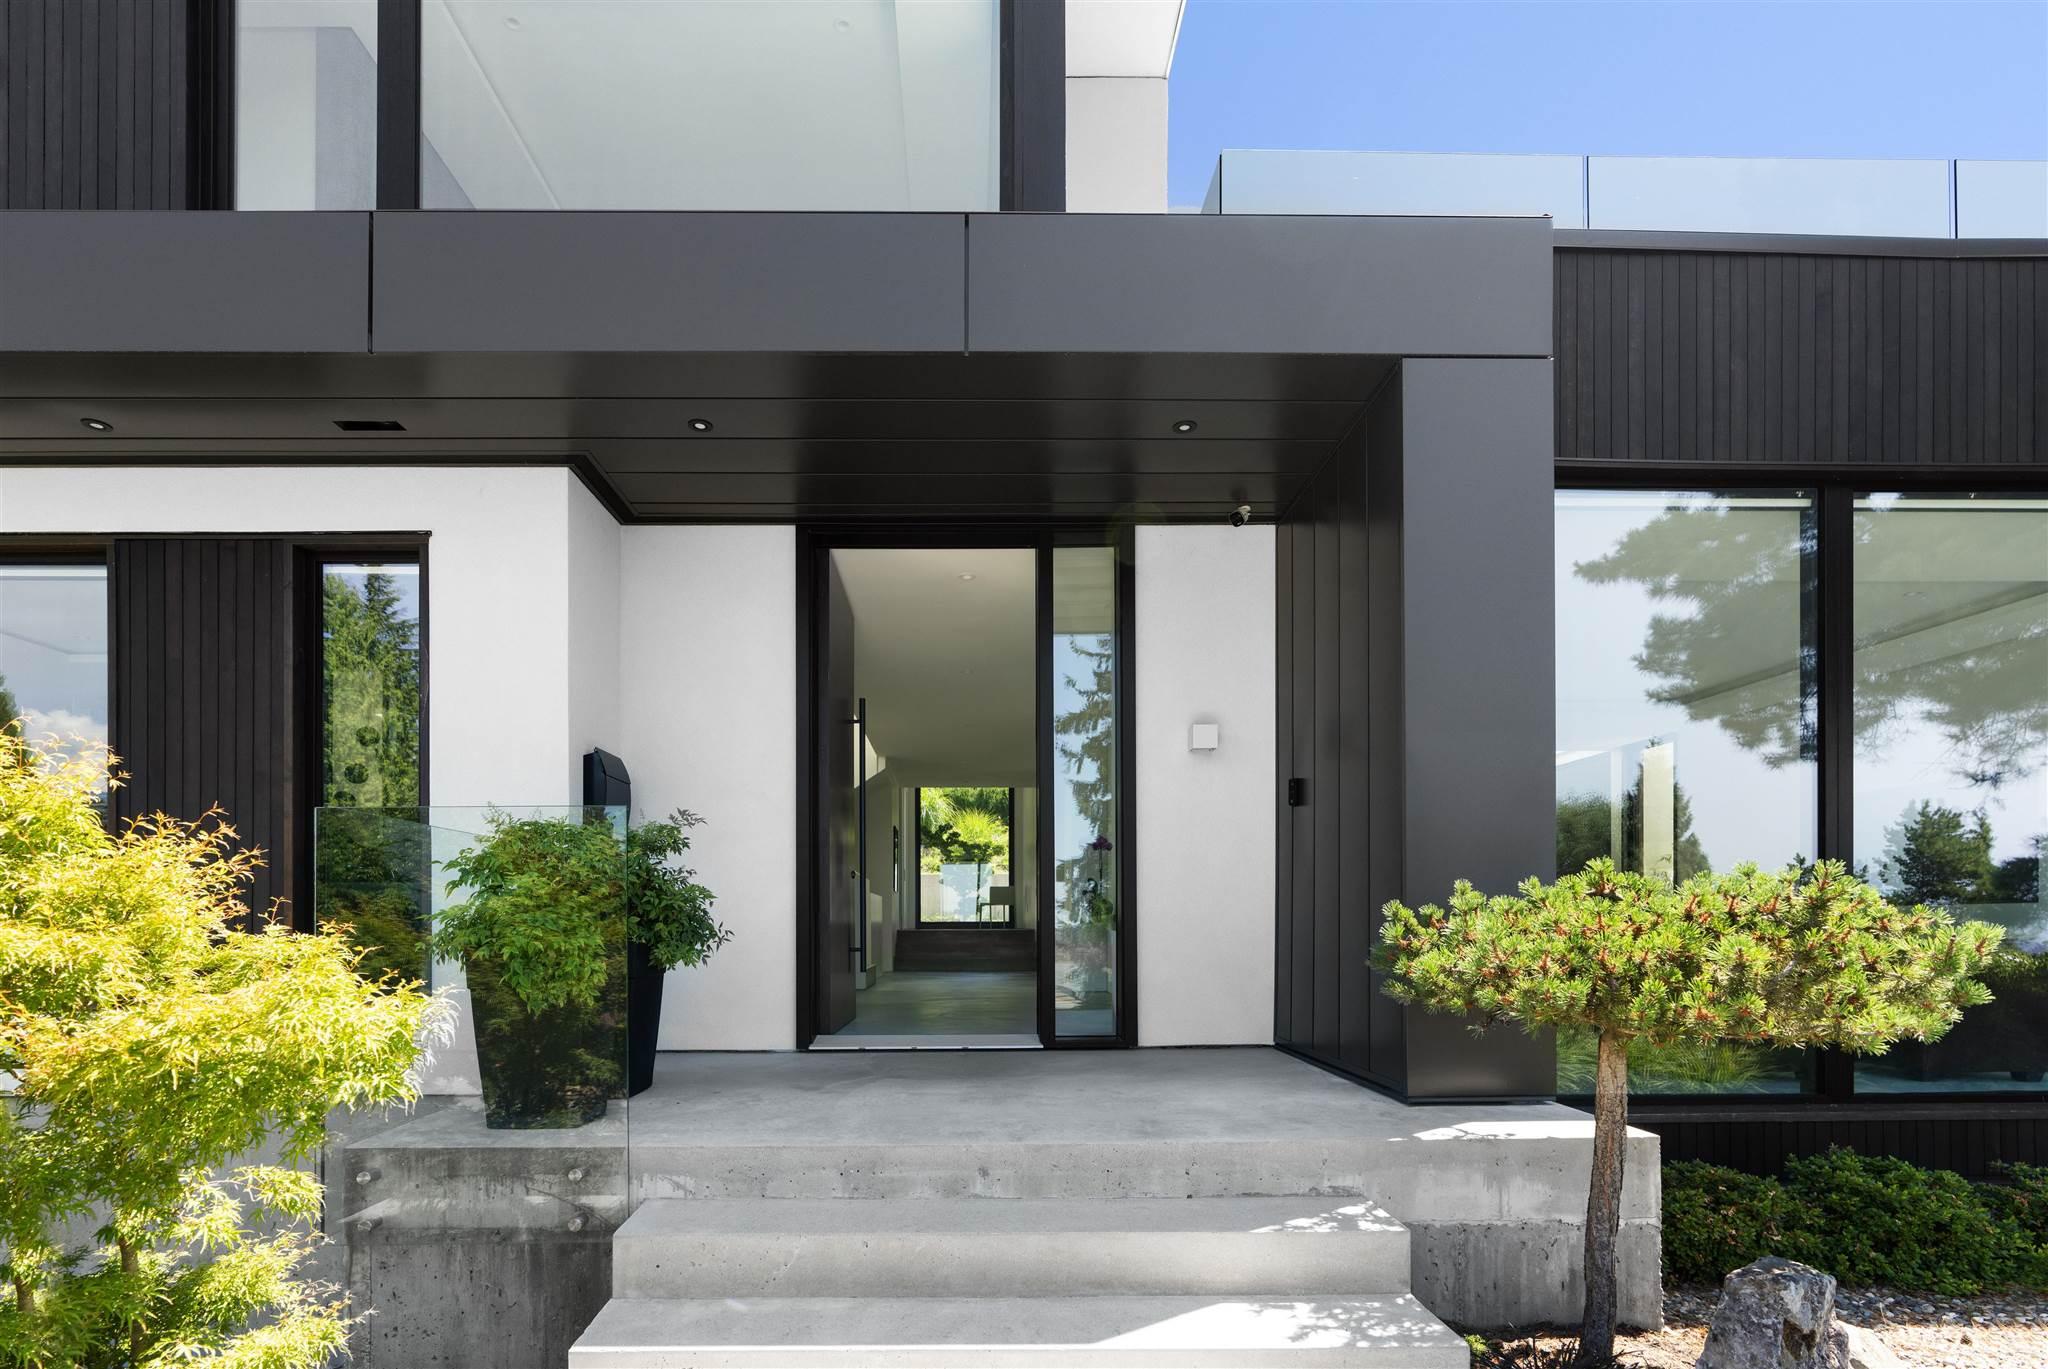 276 SANDRINGHAM CRESCENT - Upper Lonsdale House/Single Family for sale, 7 Bedrooms (R2617703) - #3